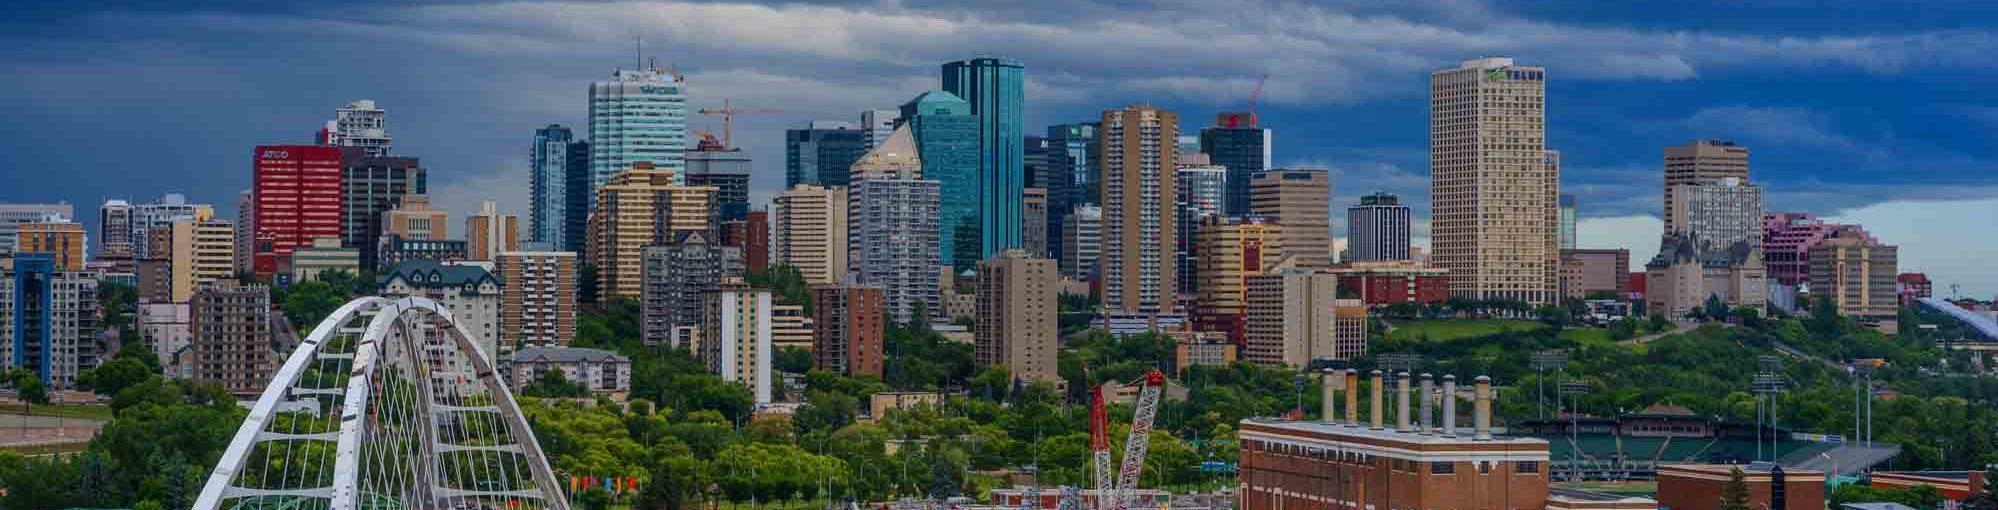 Edmonton Skyline - photo by Kurt Bauschardt (https://www.flickr.com/photos/kurt-b/)